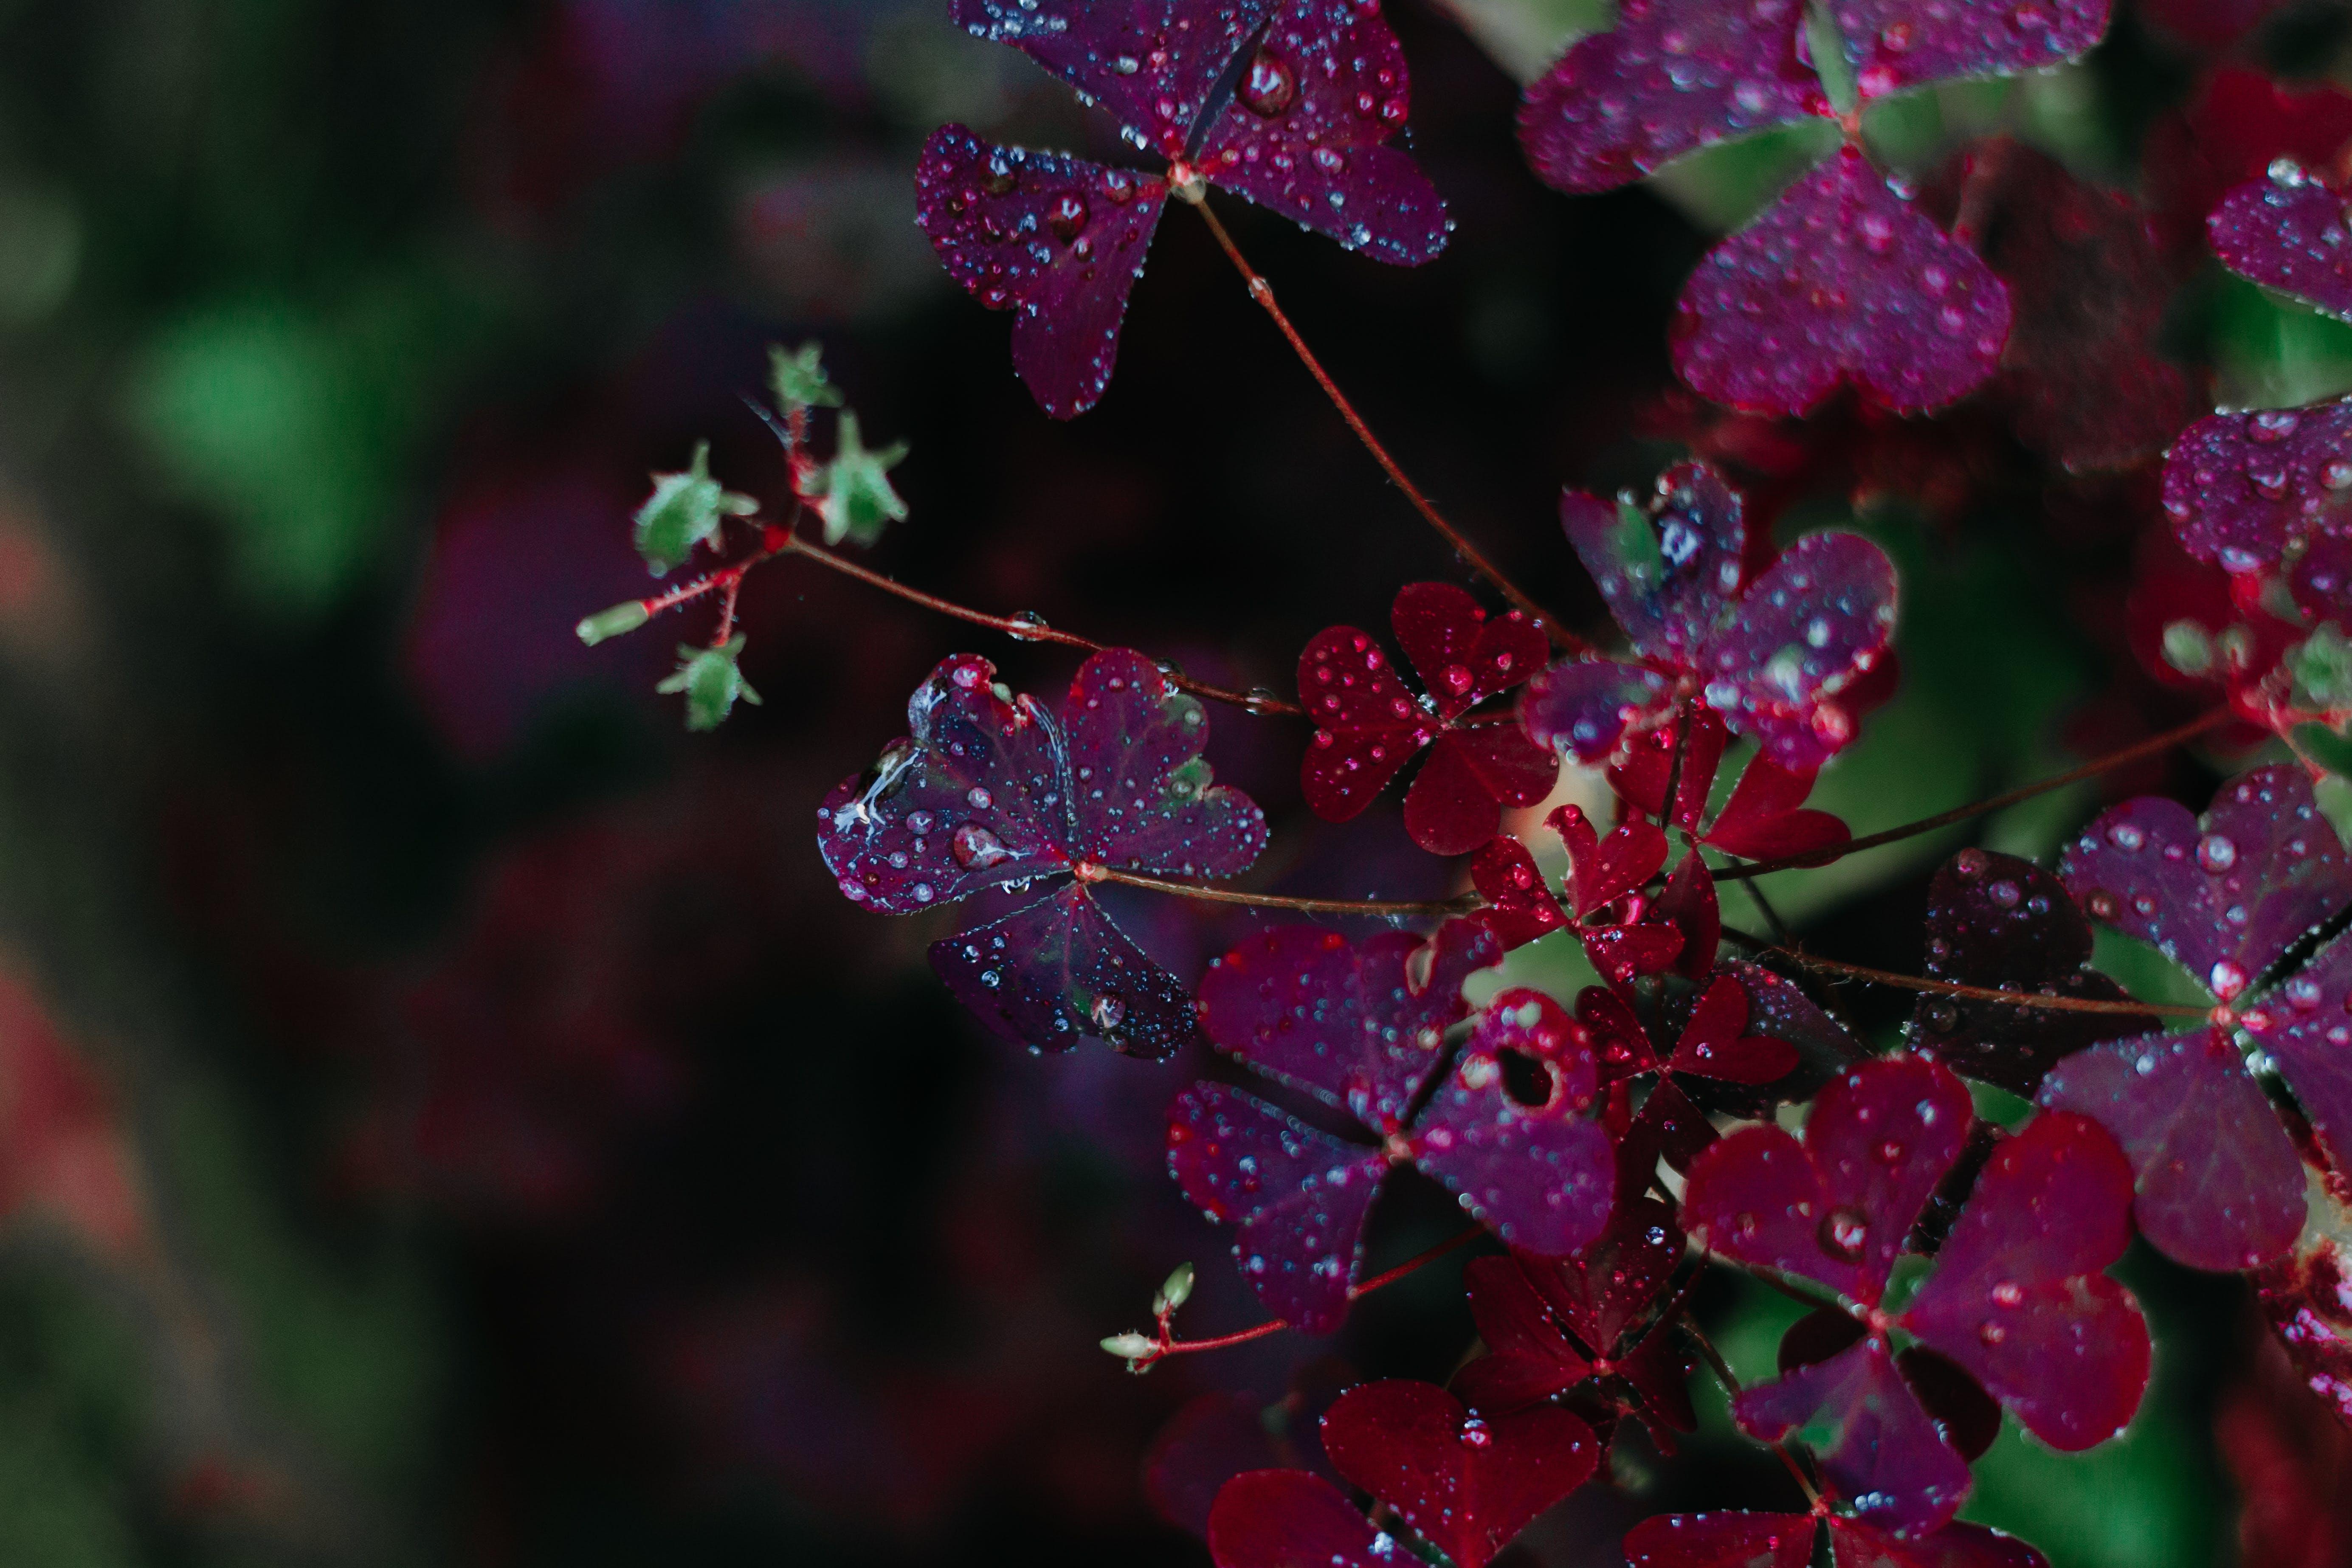 Closeup Photo of Maroon Petaled Flowers